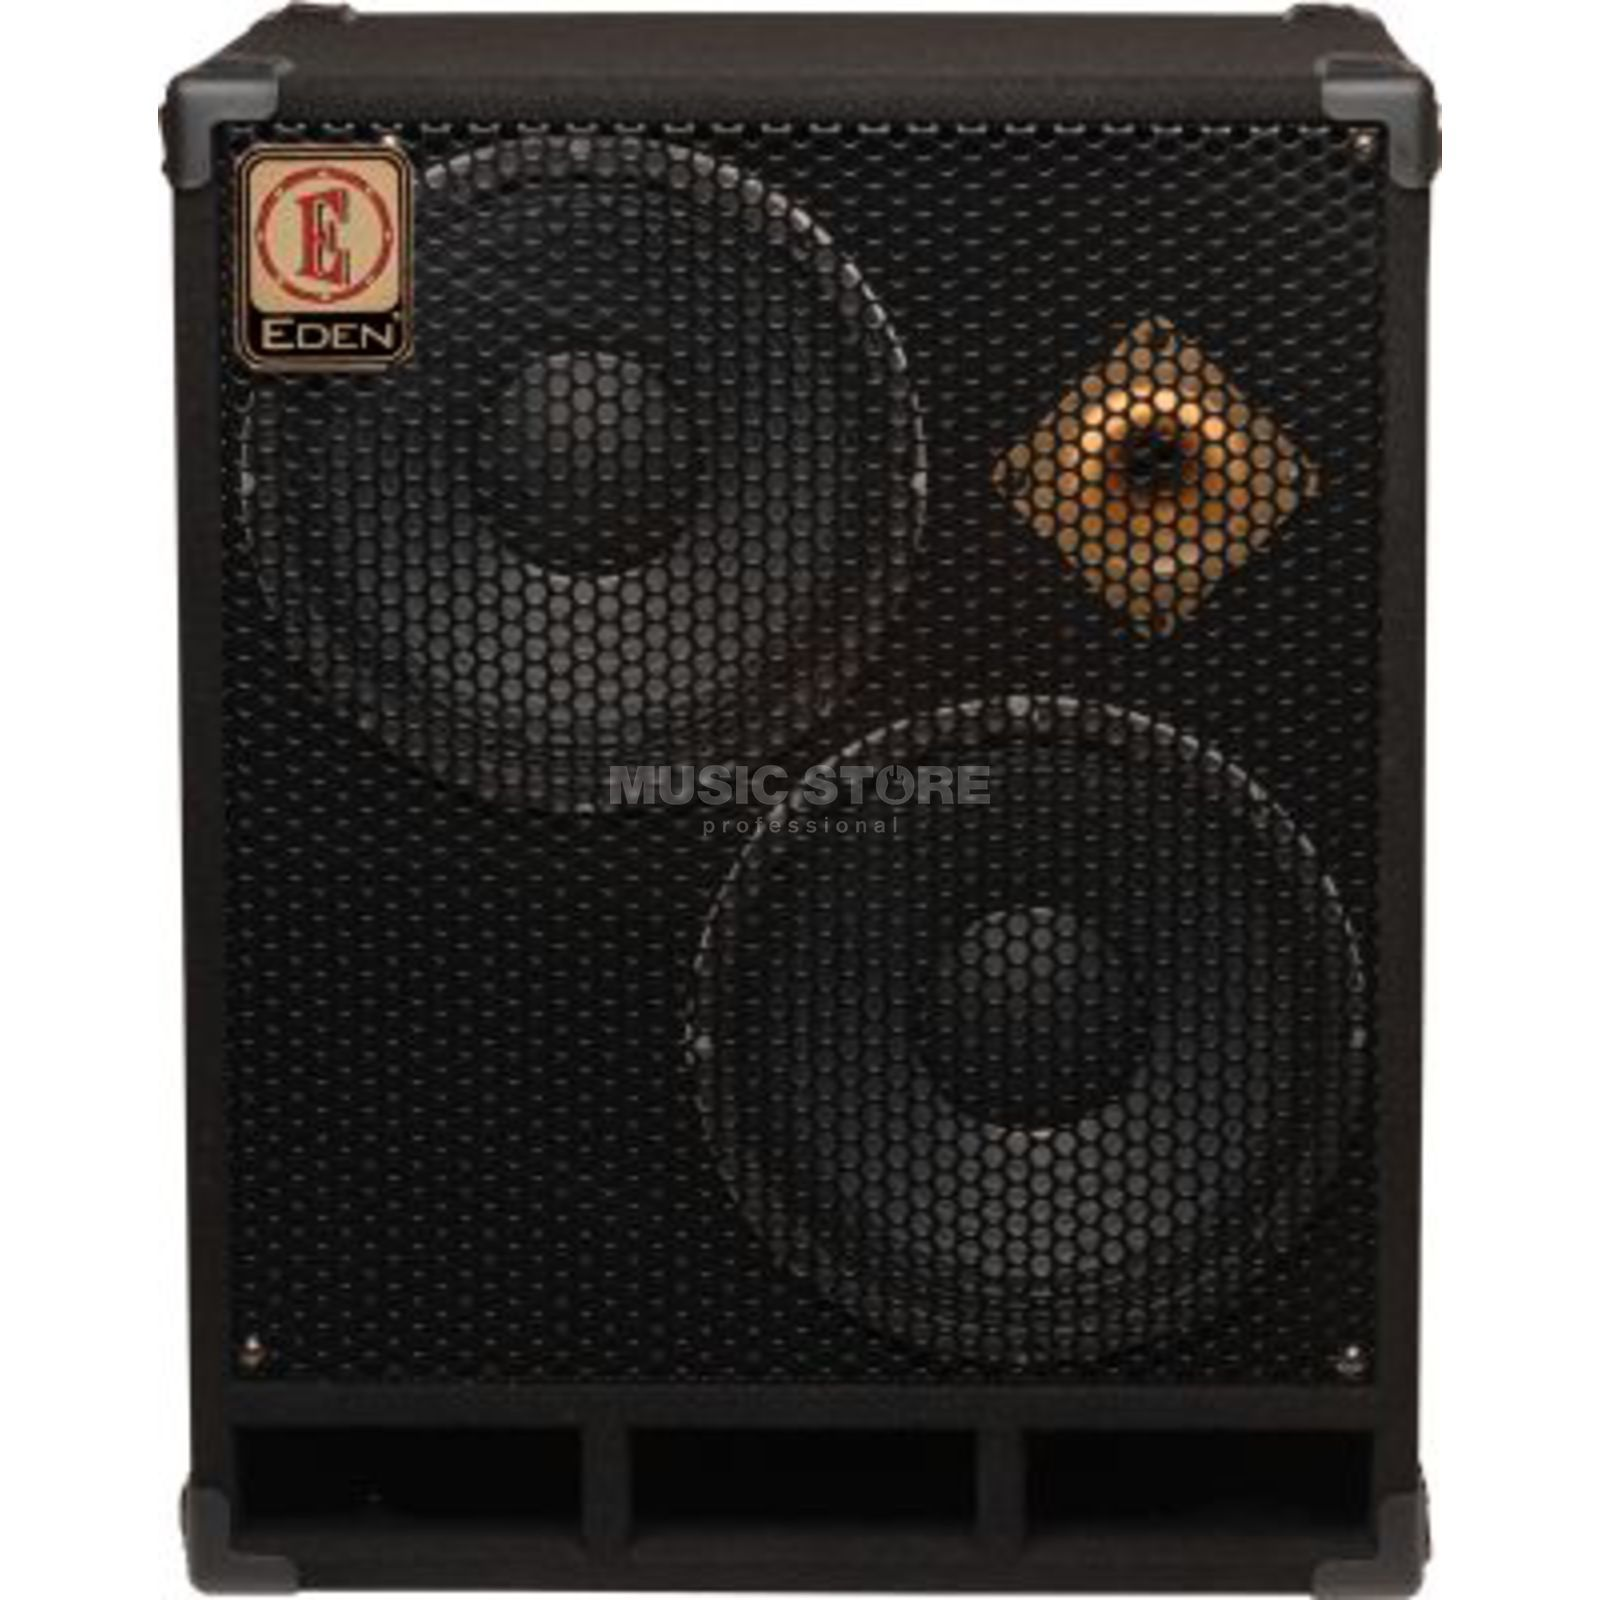 united photos robkitley cabinet amp bass rob pod xt london kitley gallien krueger guitarist pro kingdom